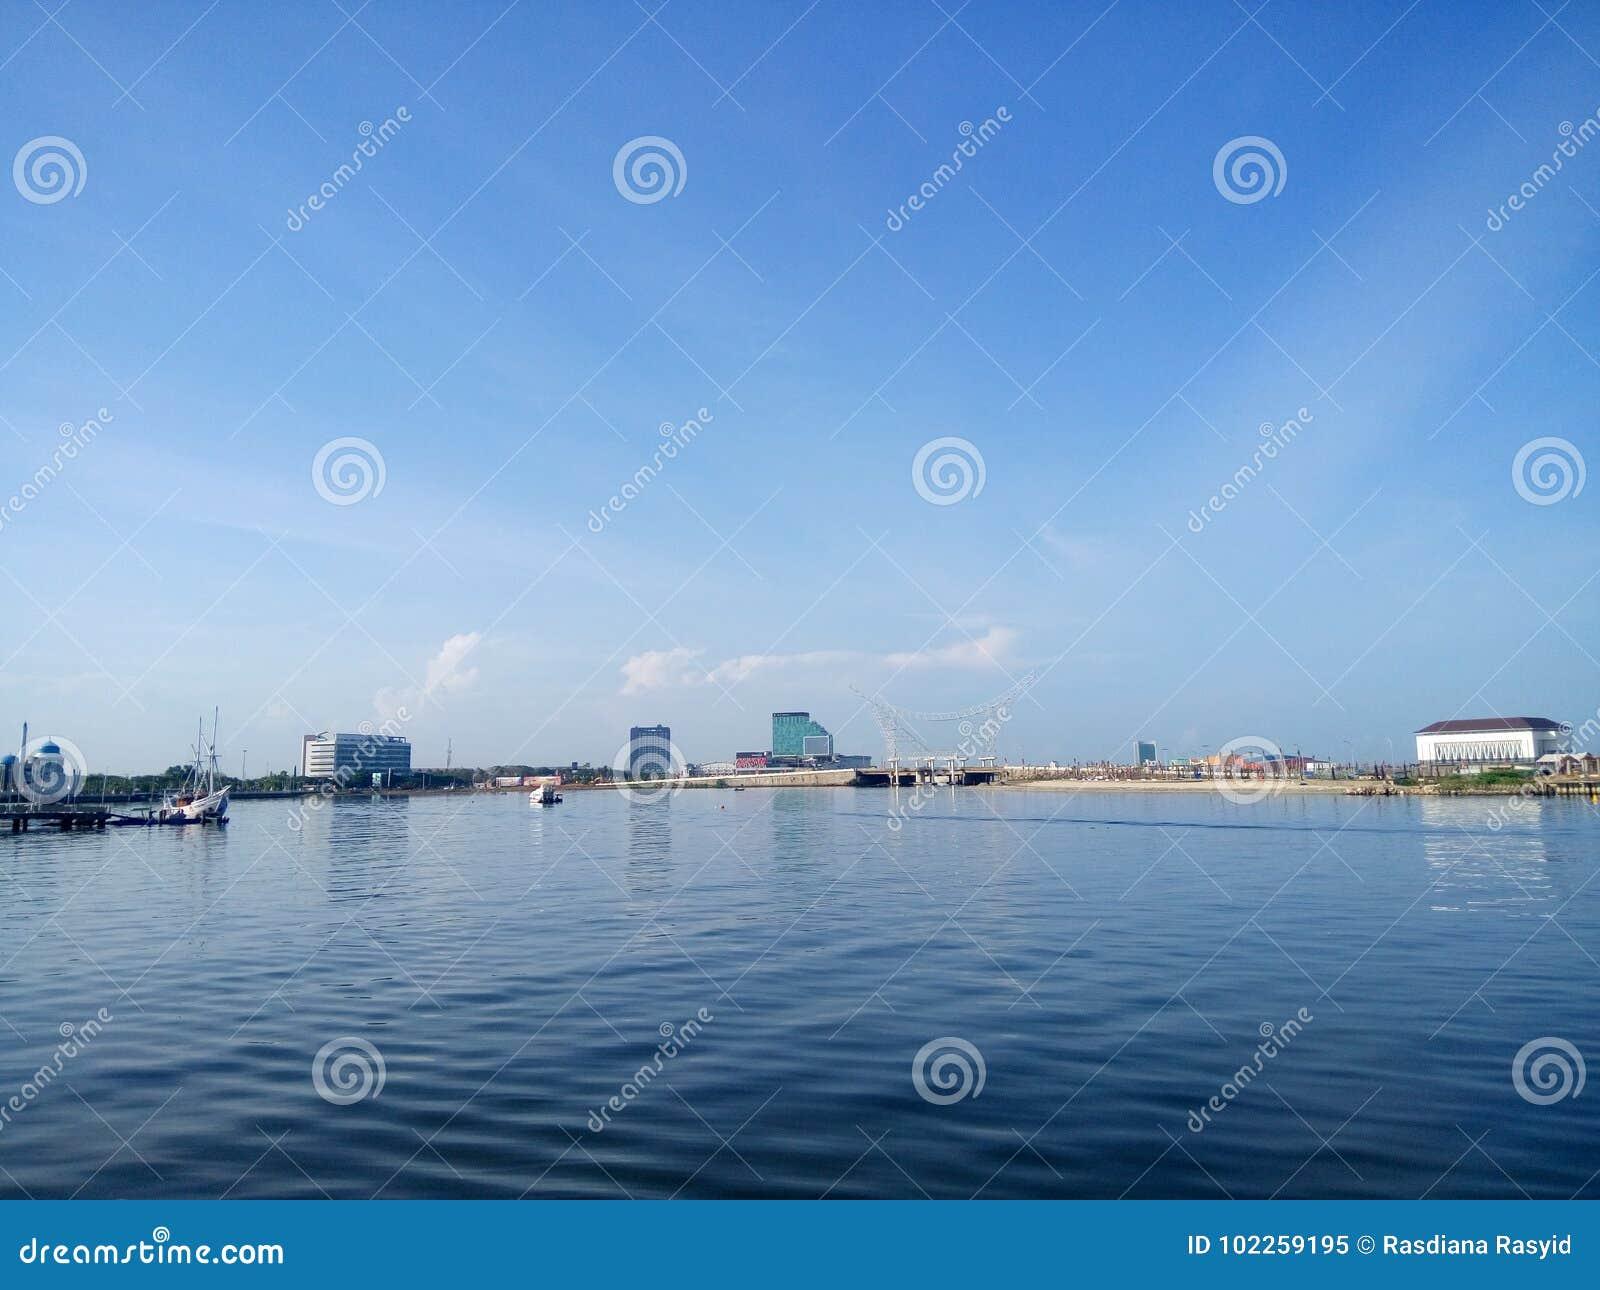 Sea of Makassar City